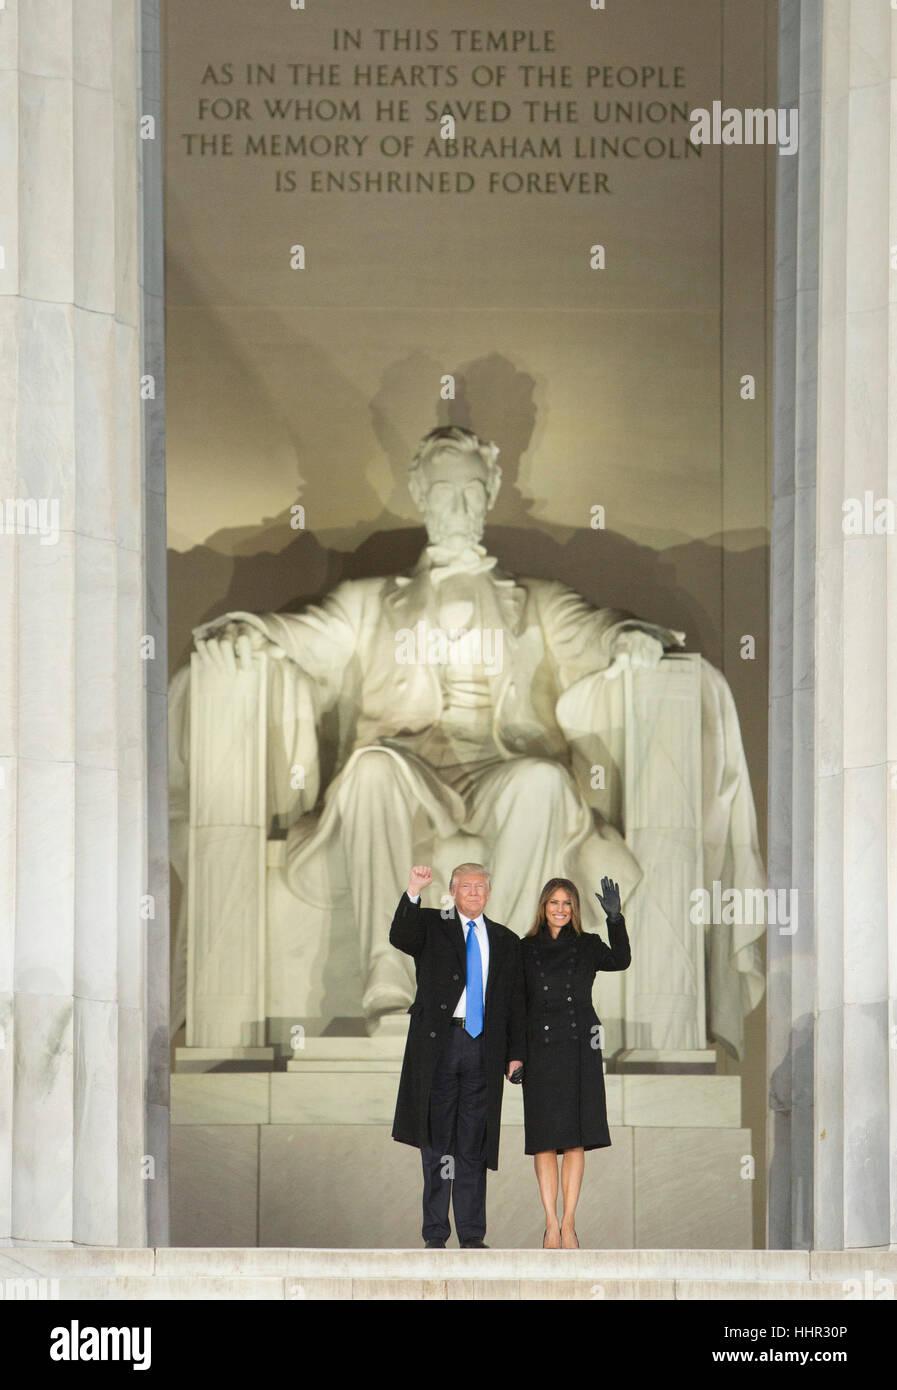 Arlington, USA. 19. Januar 2017. Gewählter Präsident der Vereinigten Staaten Donald J. Trump und Elect FIRST LADY Stockfoto